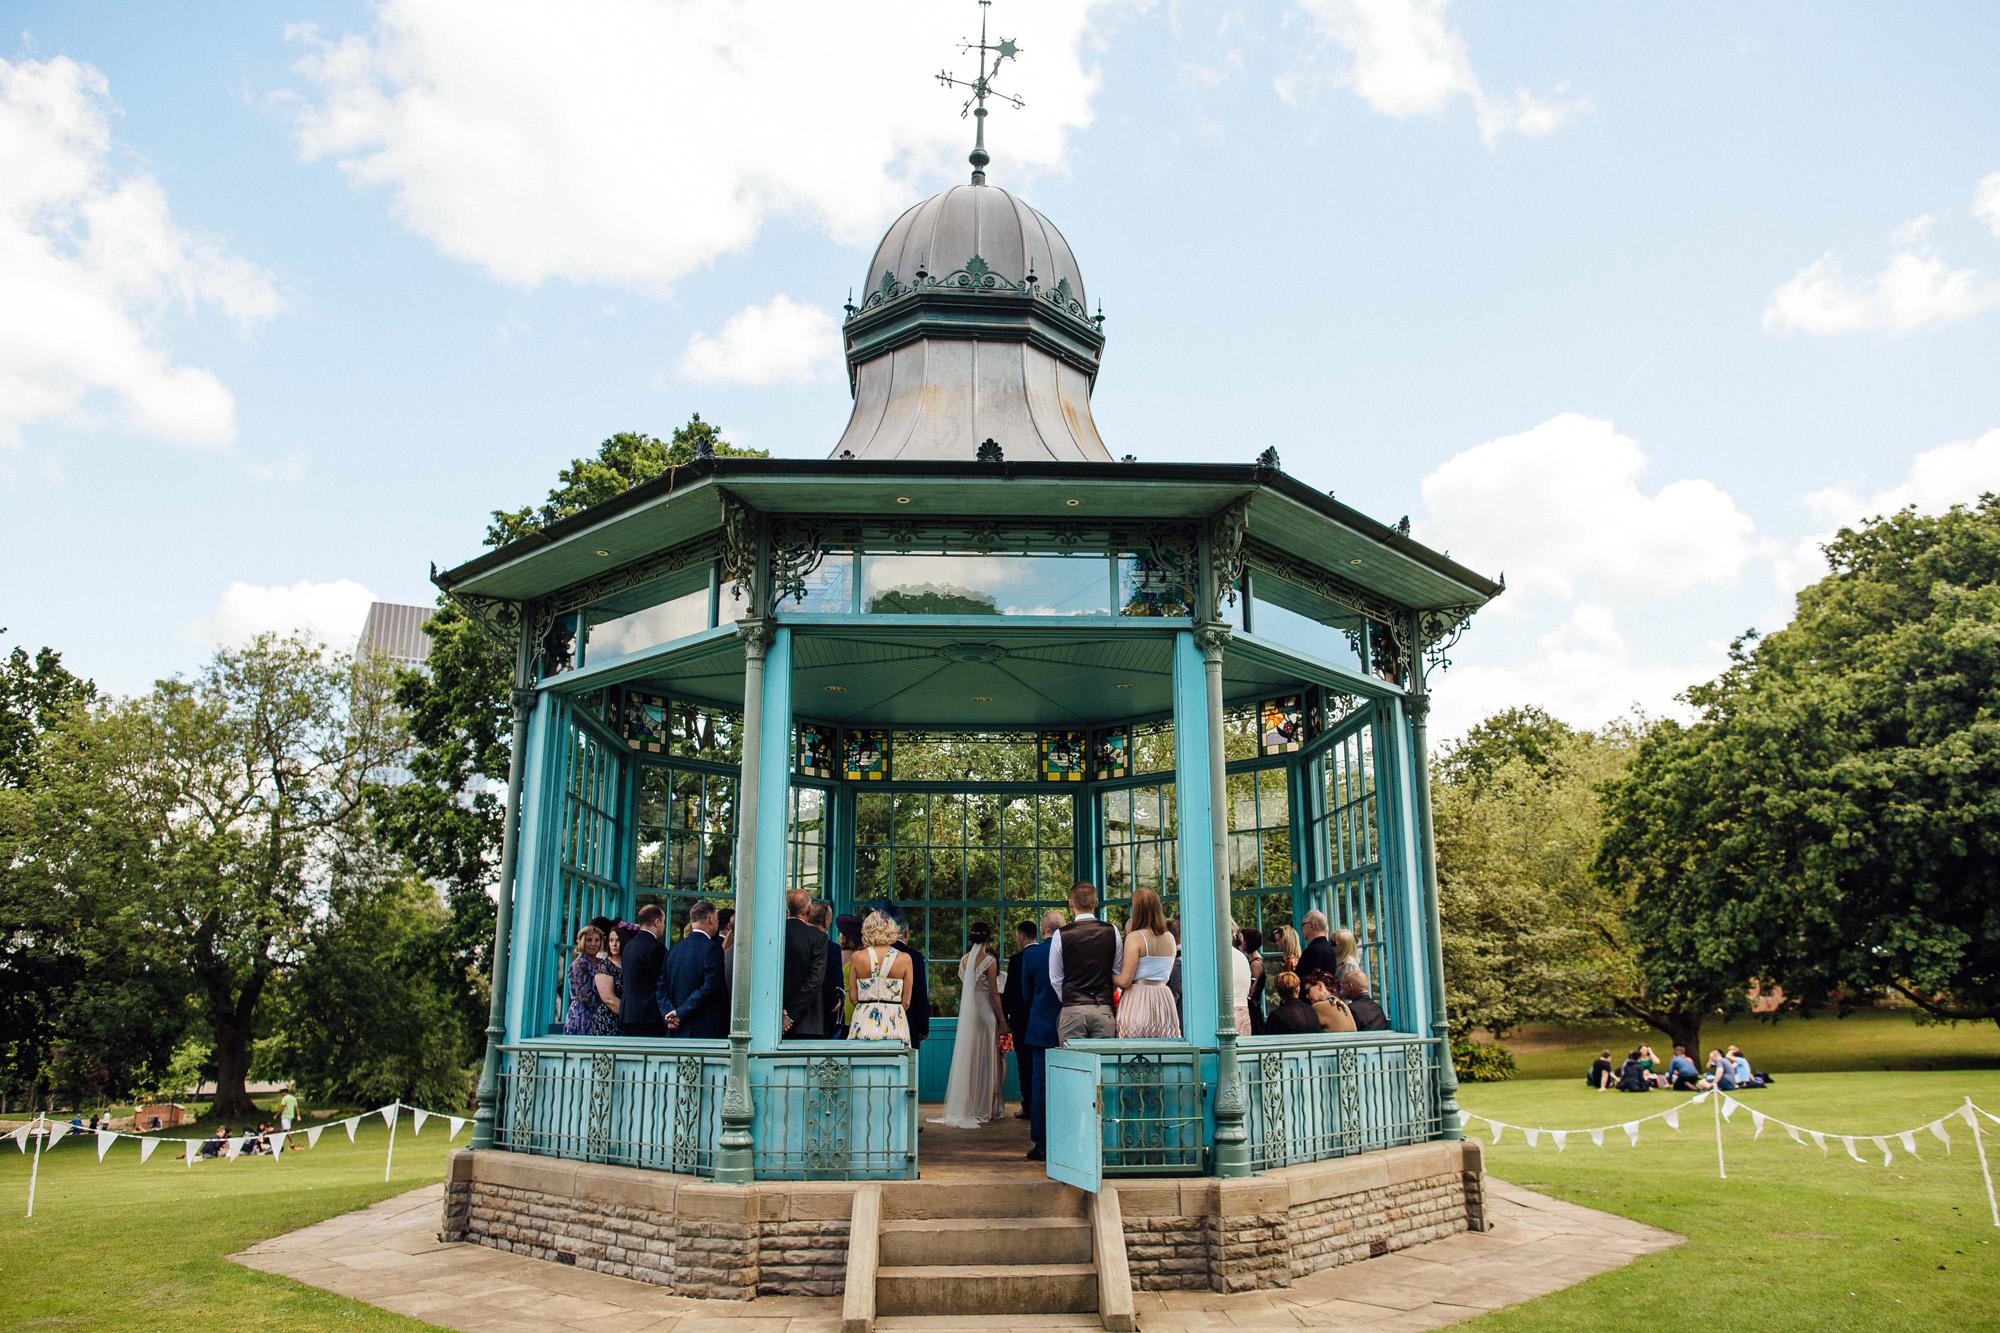 Sarah-Honeysuckle-Bias-Cut-Silk-Vintage-Inspired-Wedding-Gown-Sheffield-Wedding-Kate-Beaumont-17.jpg